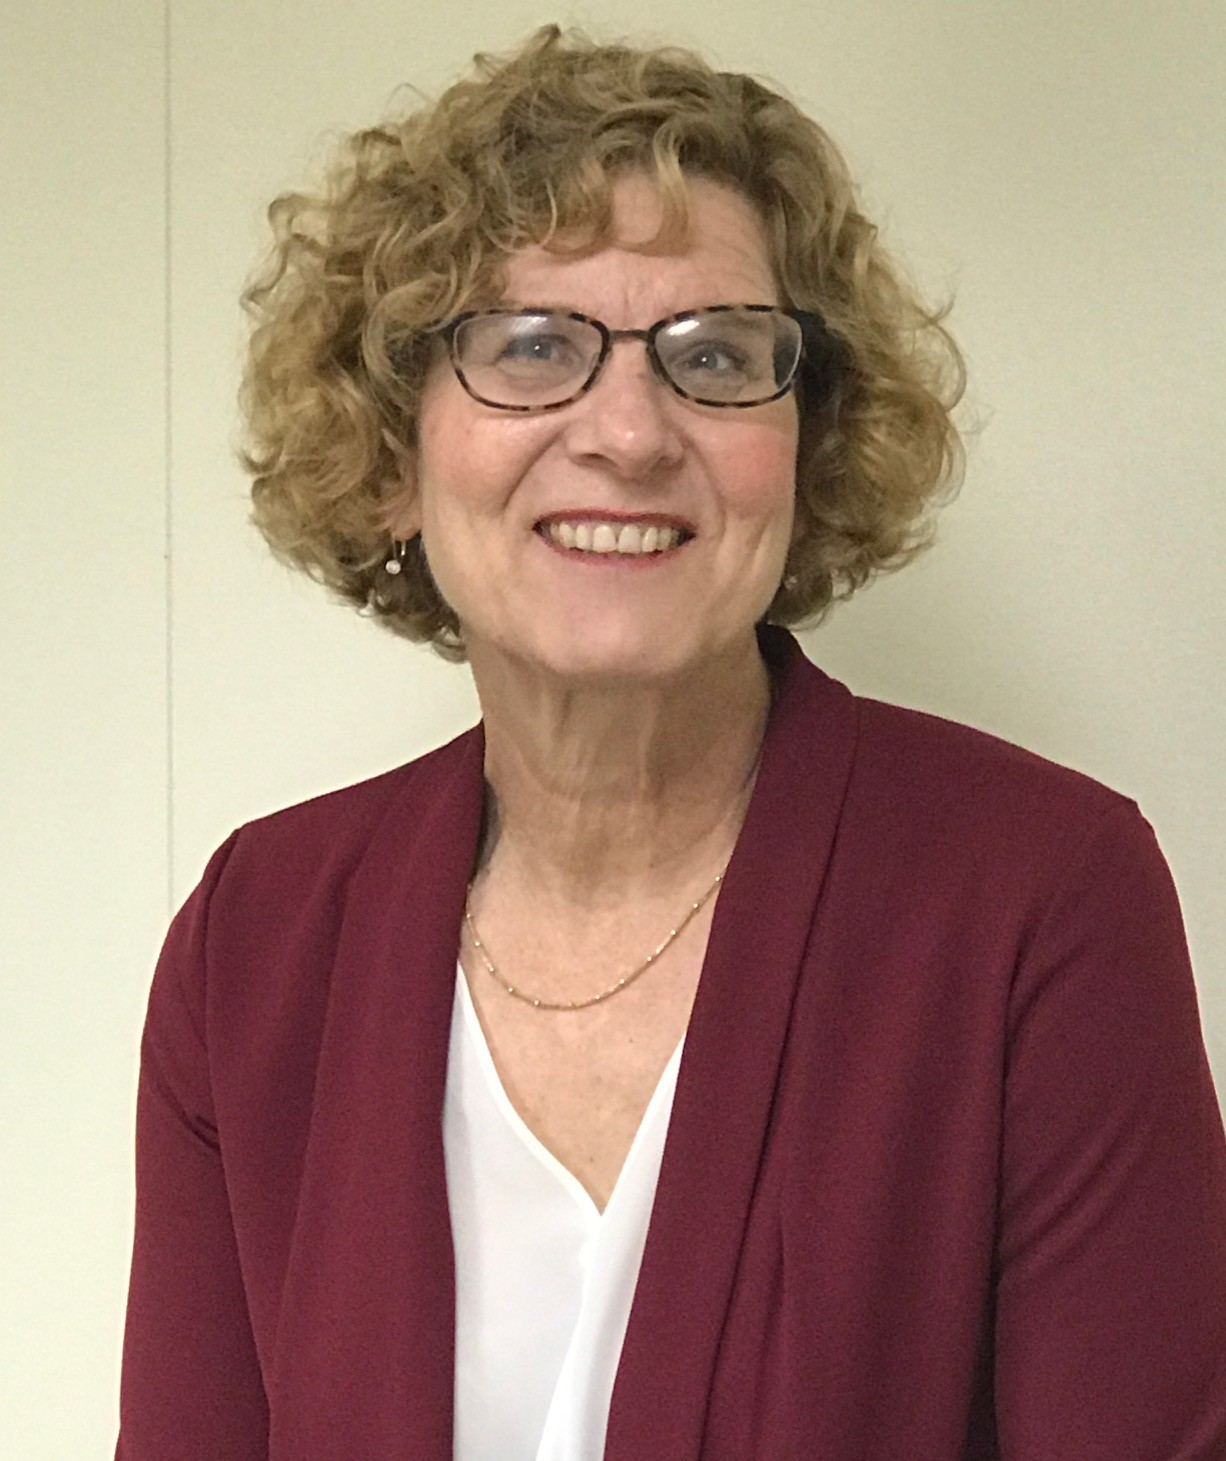 Denise J. Collins